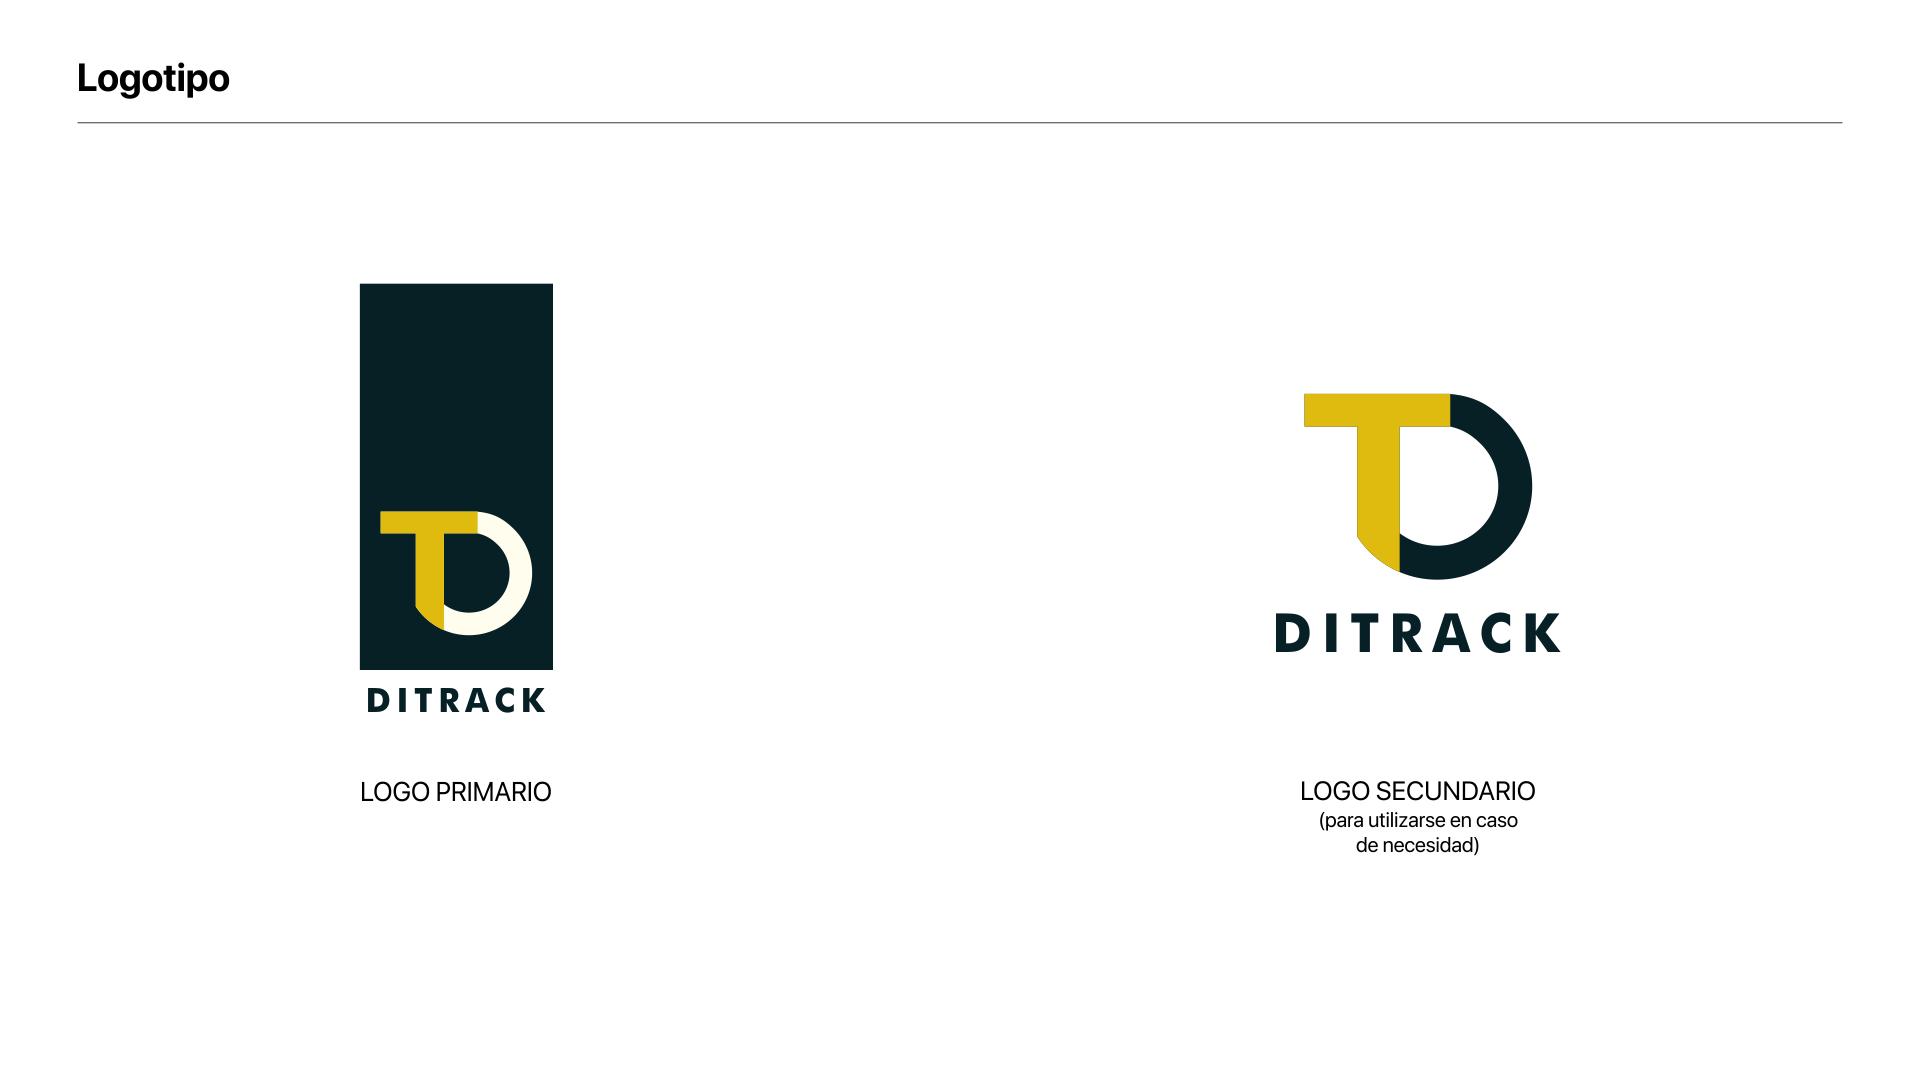 Logotipos ditrack